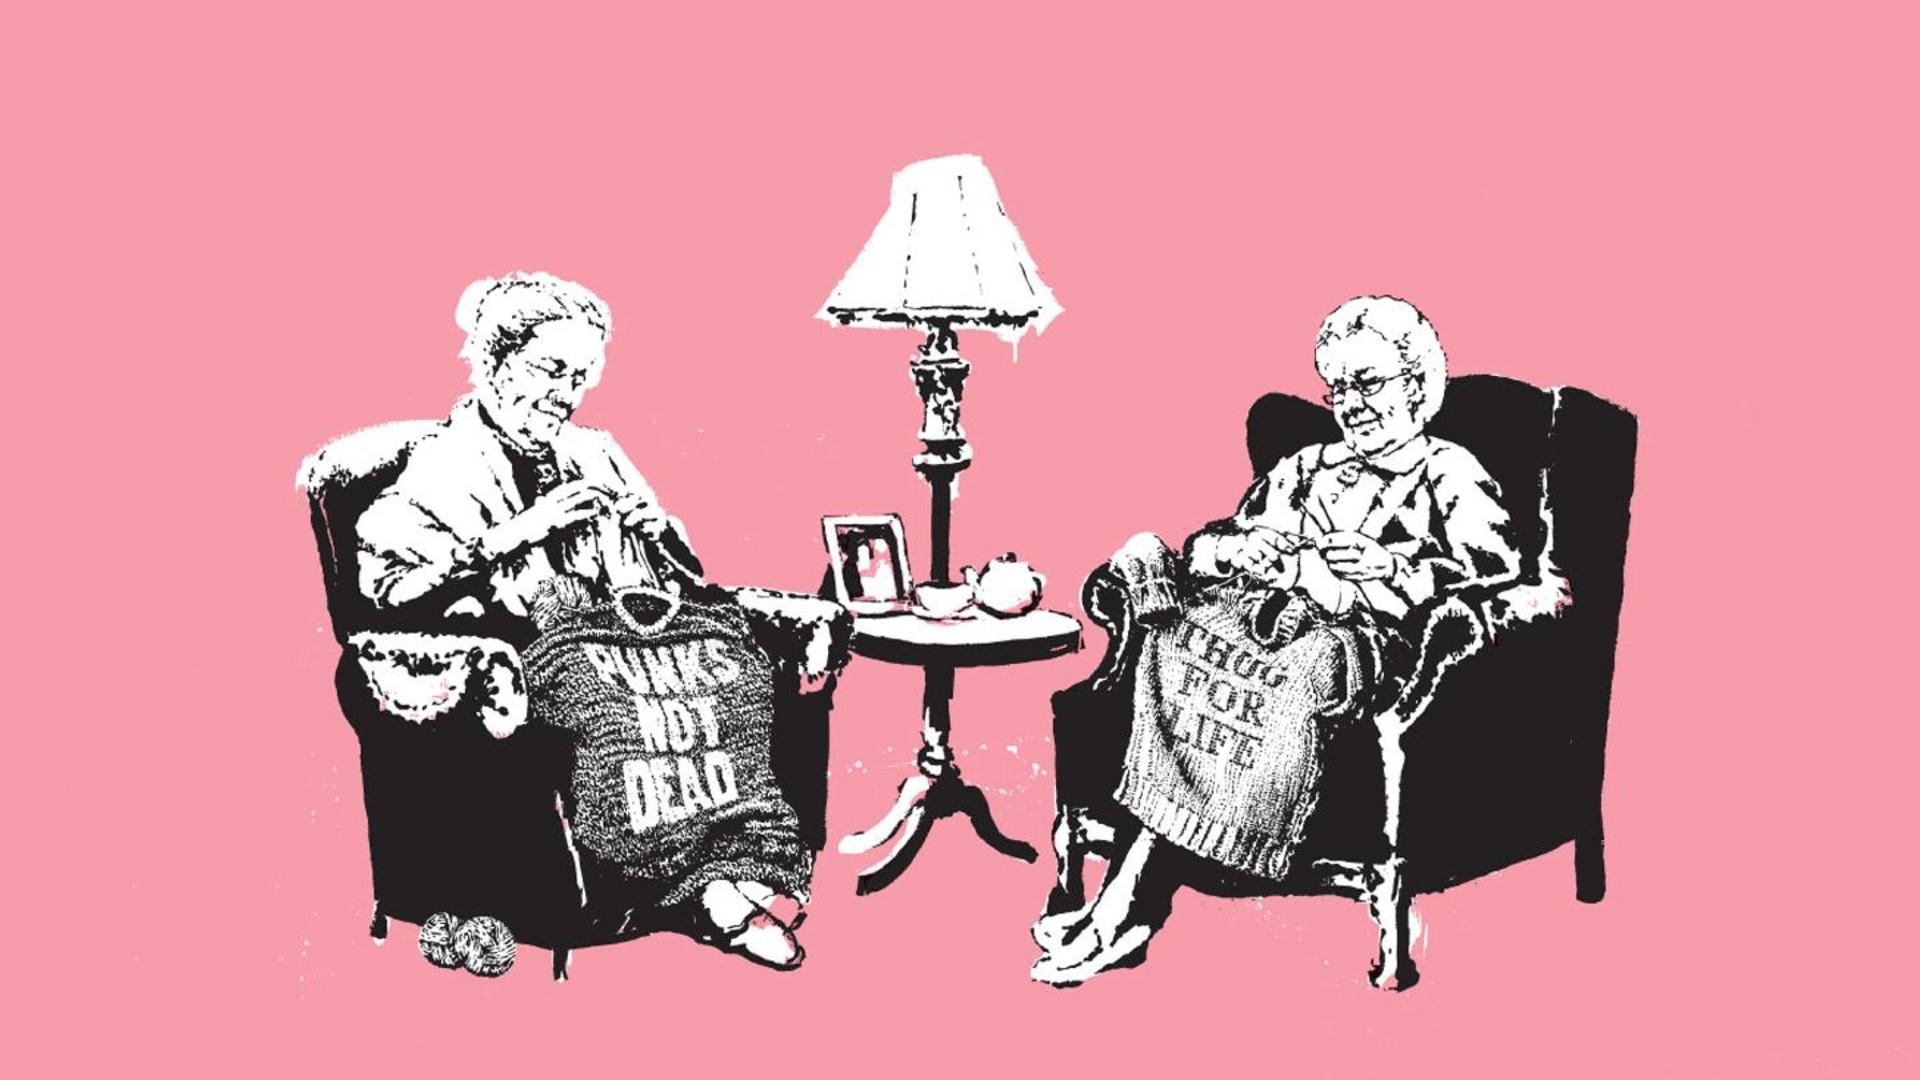 Banksy HD Wallpaper (67+ images)